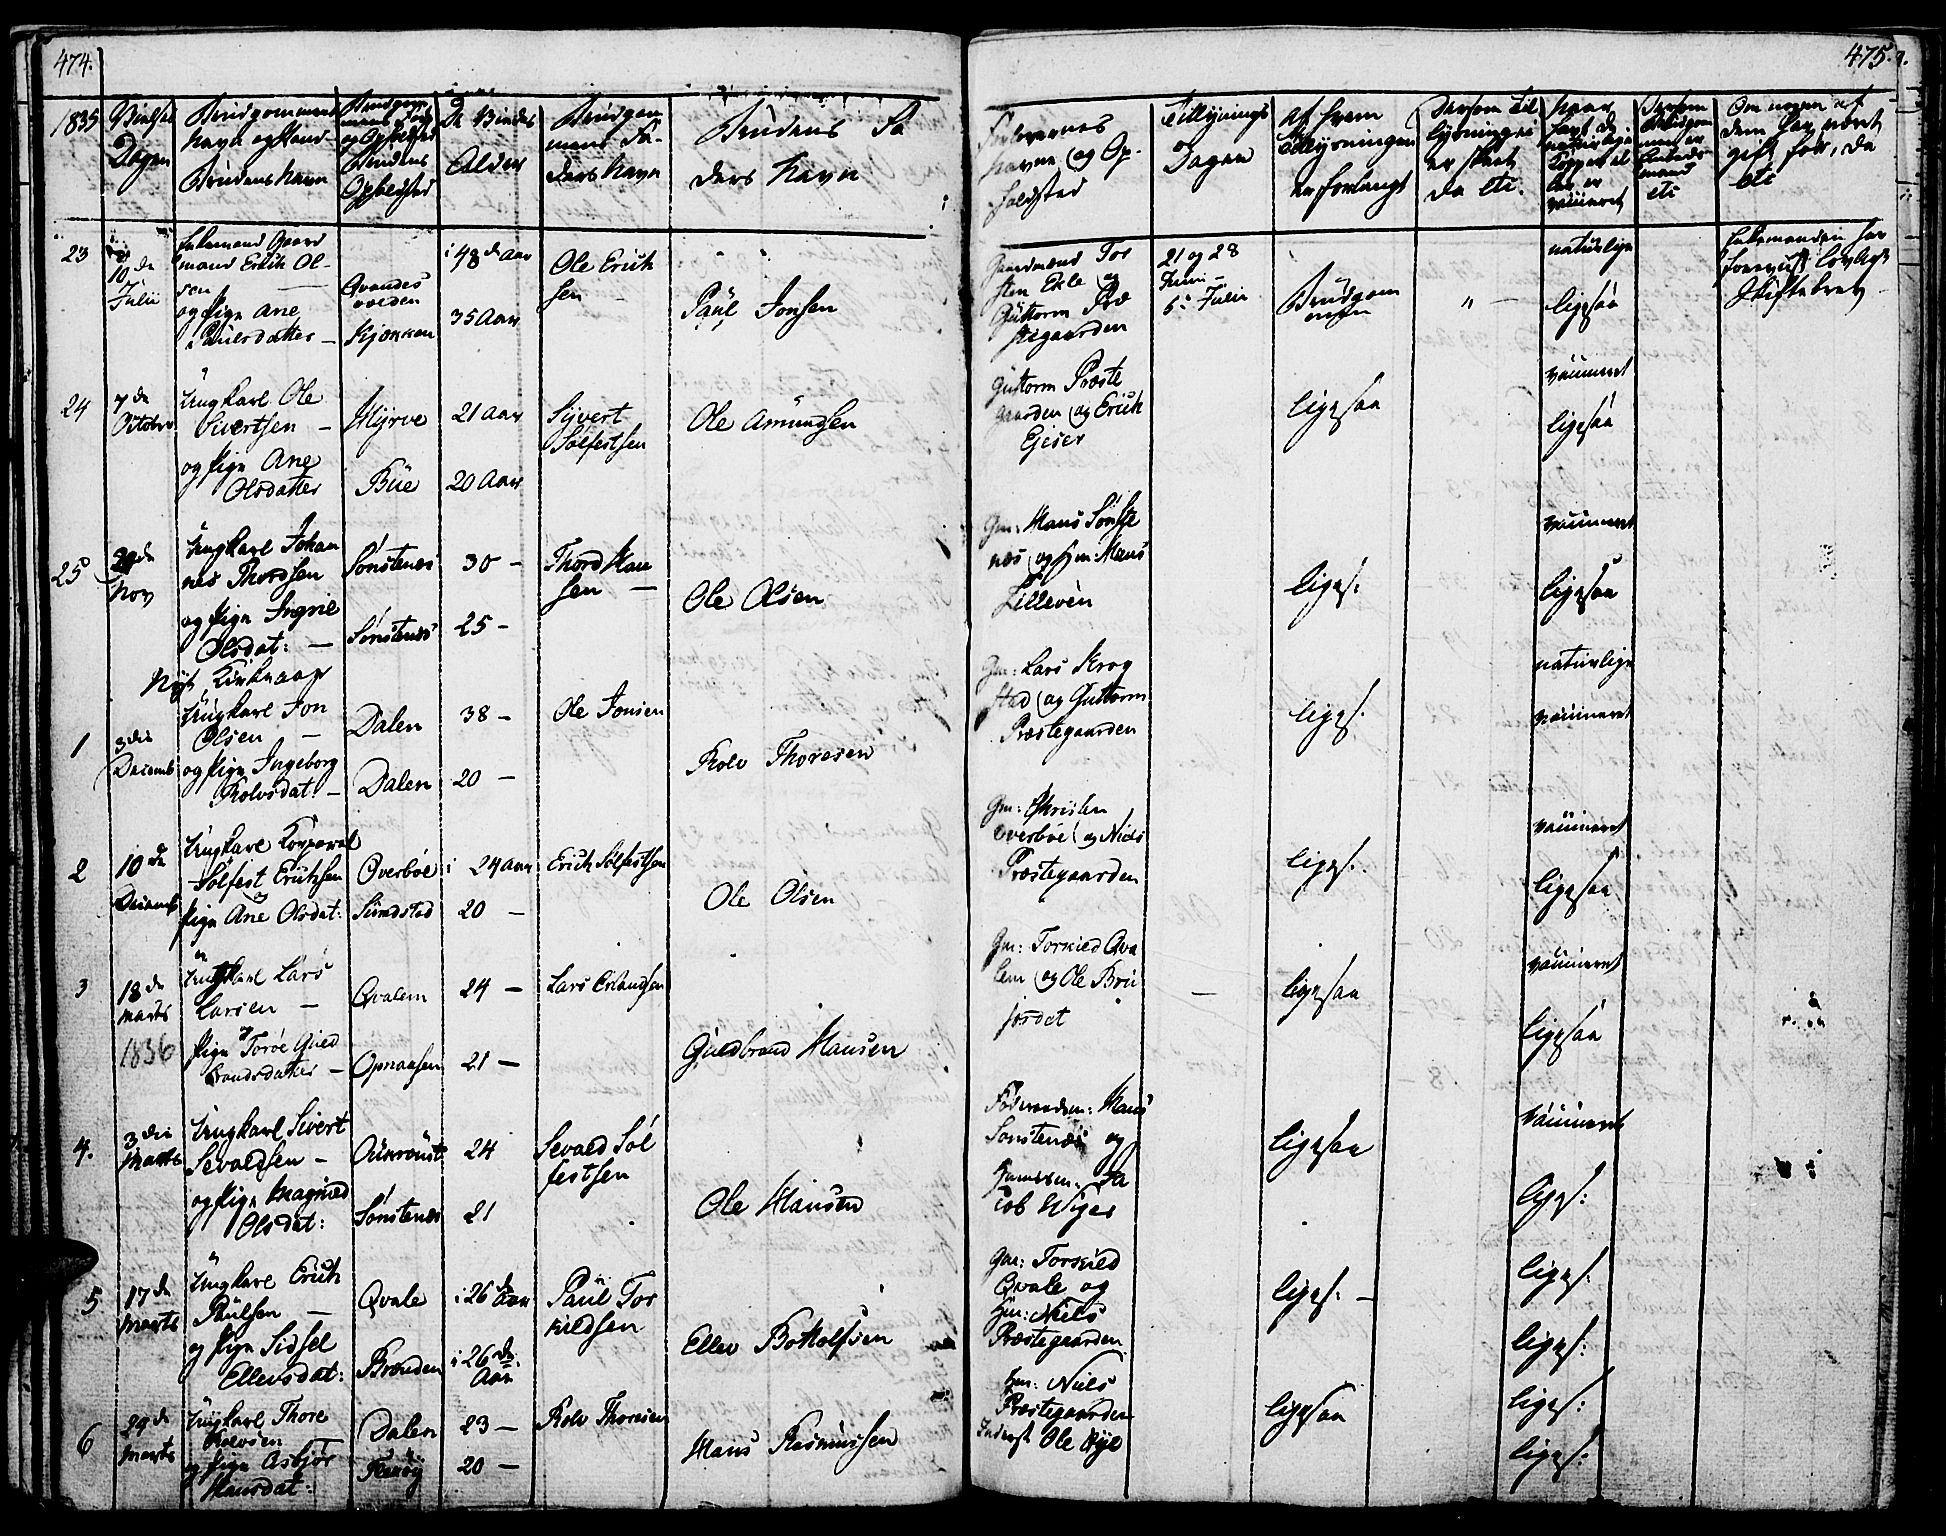 SAH, Lom prestekontor, K/L0005: Parish register (official) no. 5, 1825-1837, p. 474-475